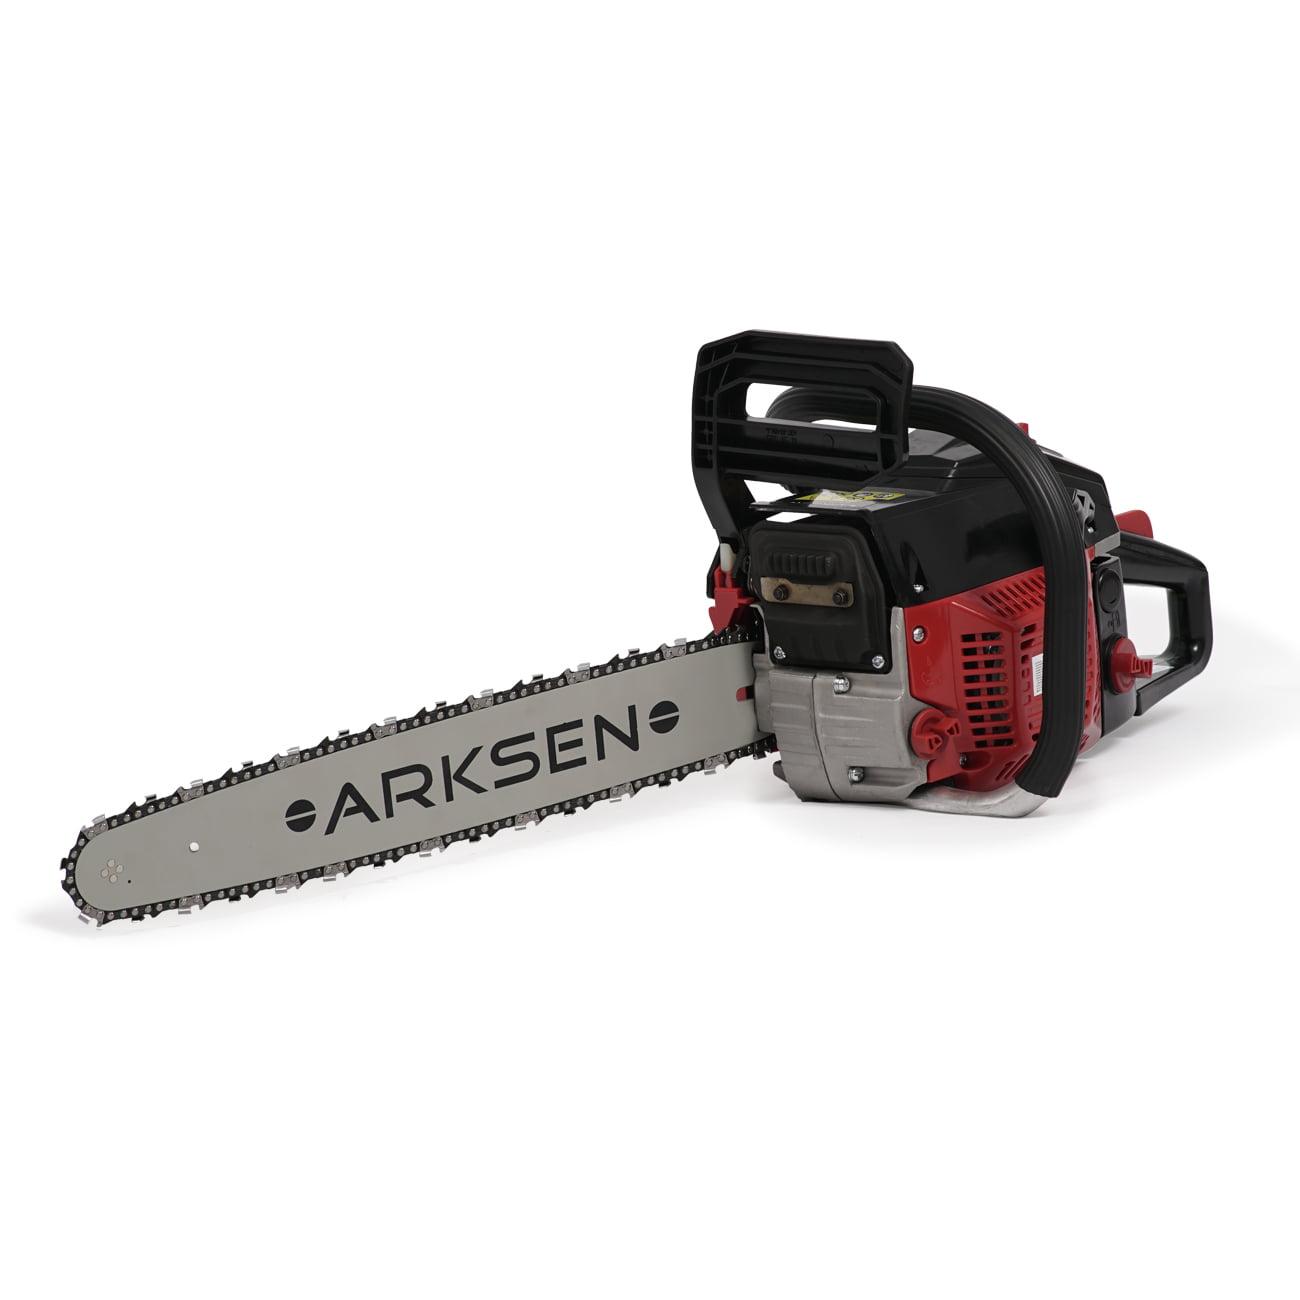 ARKSEN   Gasoline Powered Chainsaw   Wood Cutter   22 Inch Bar   w  Aluminum Crankcase   45cc   12,000 RPMs  ... by Arksen